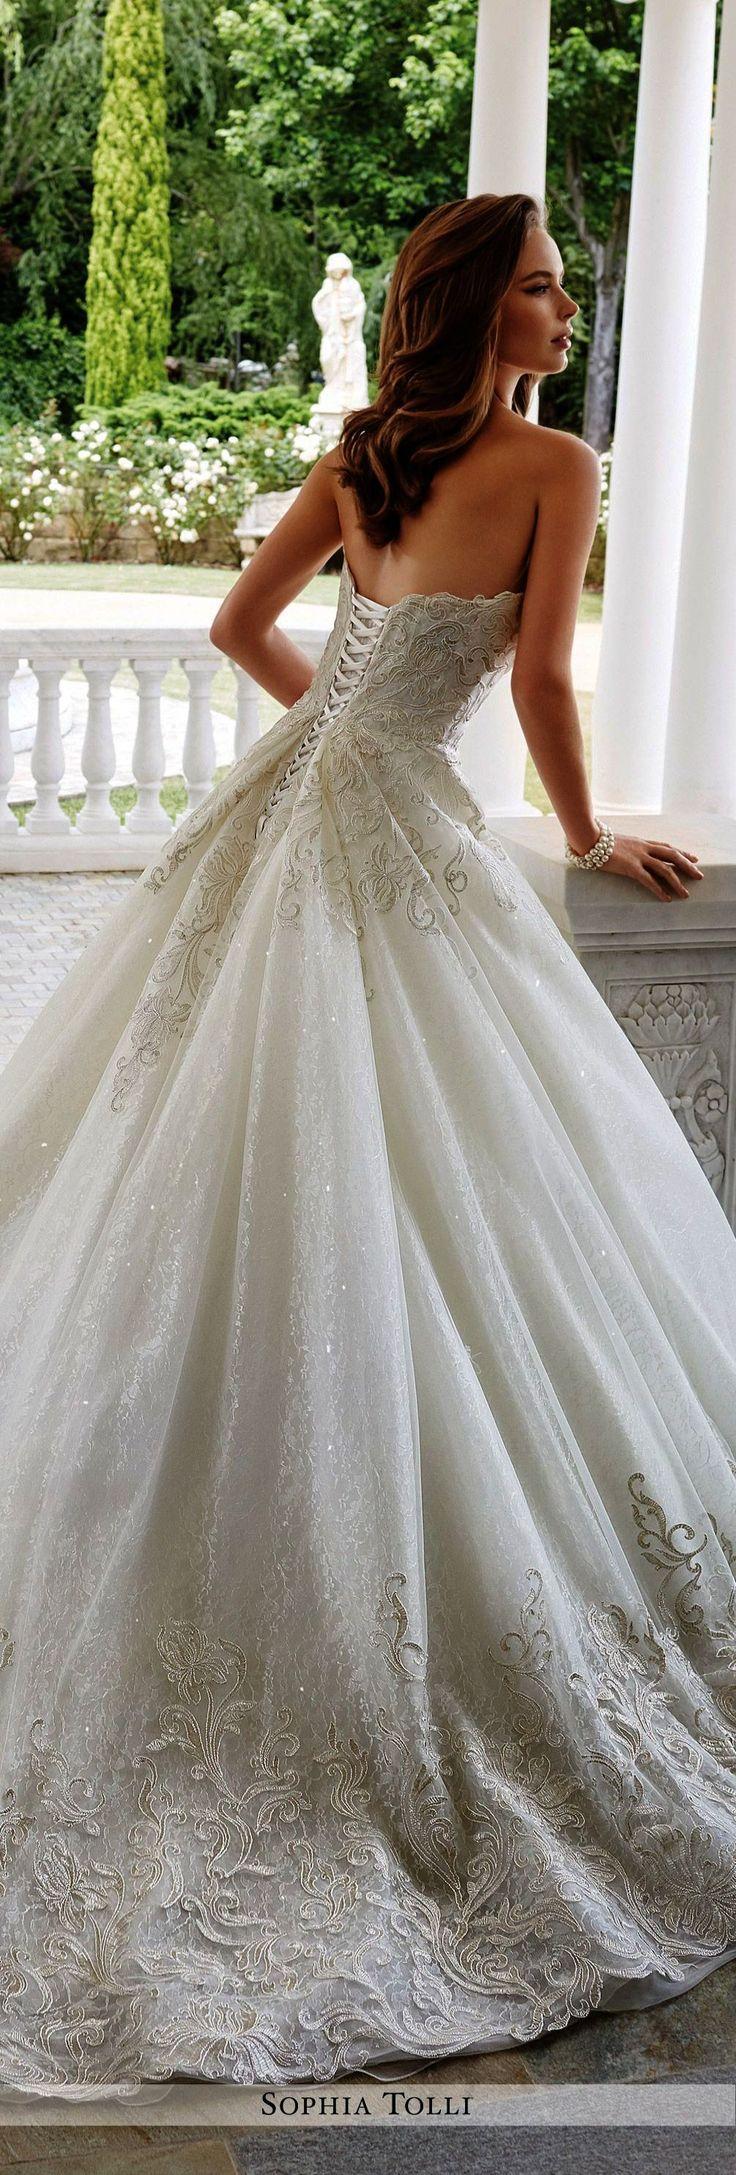 Hochzeit - Mermaid Lace Dress Weddingbee Lace Wedding Dresses For Pregnant Brides